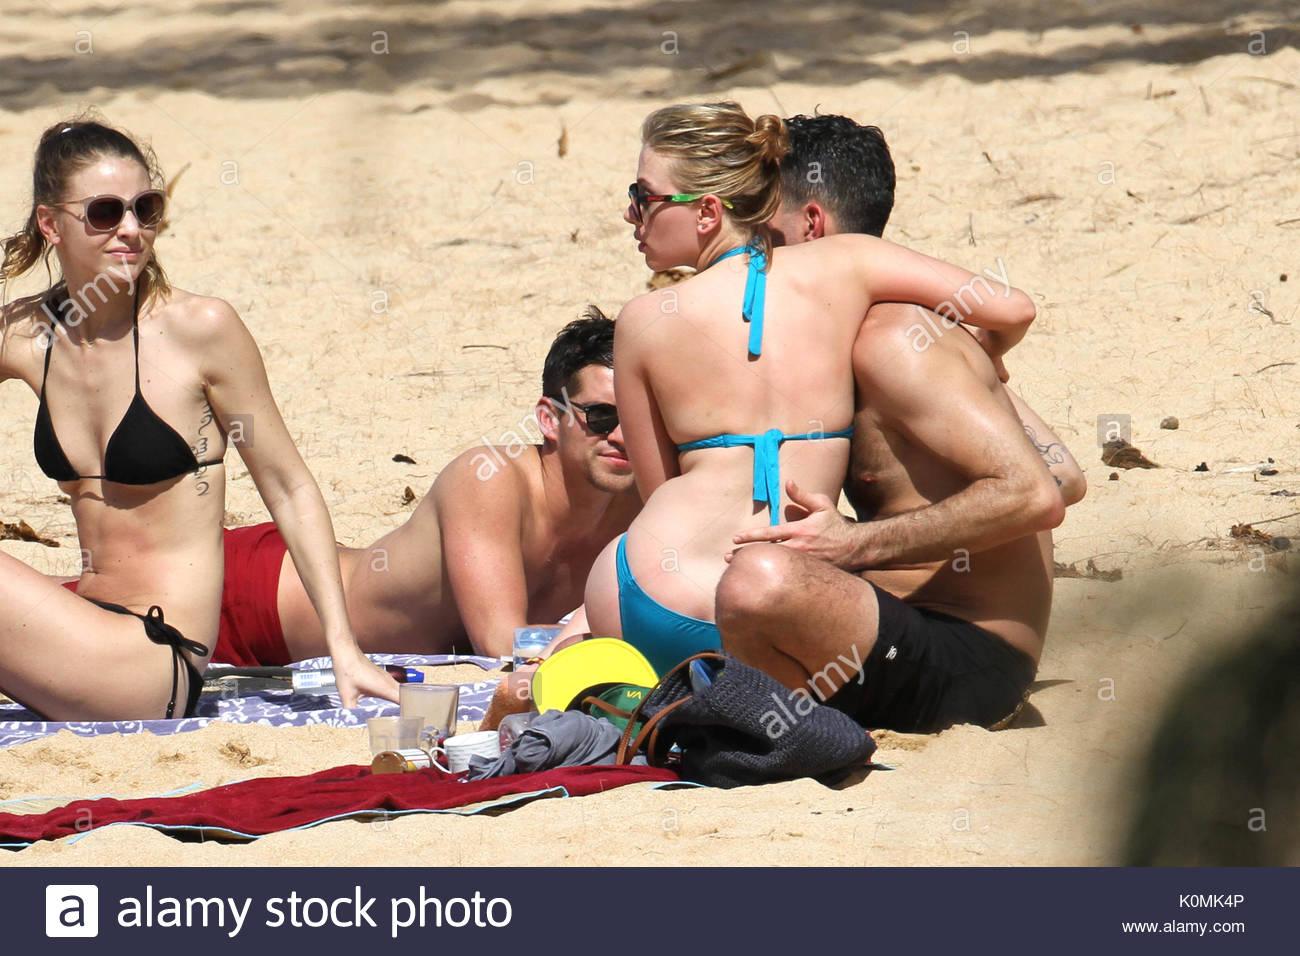 Scarlett johansson bikini pics